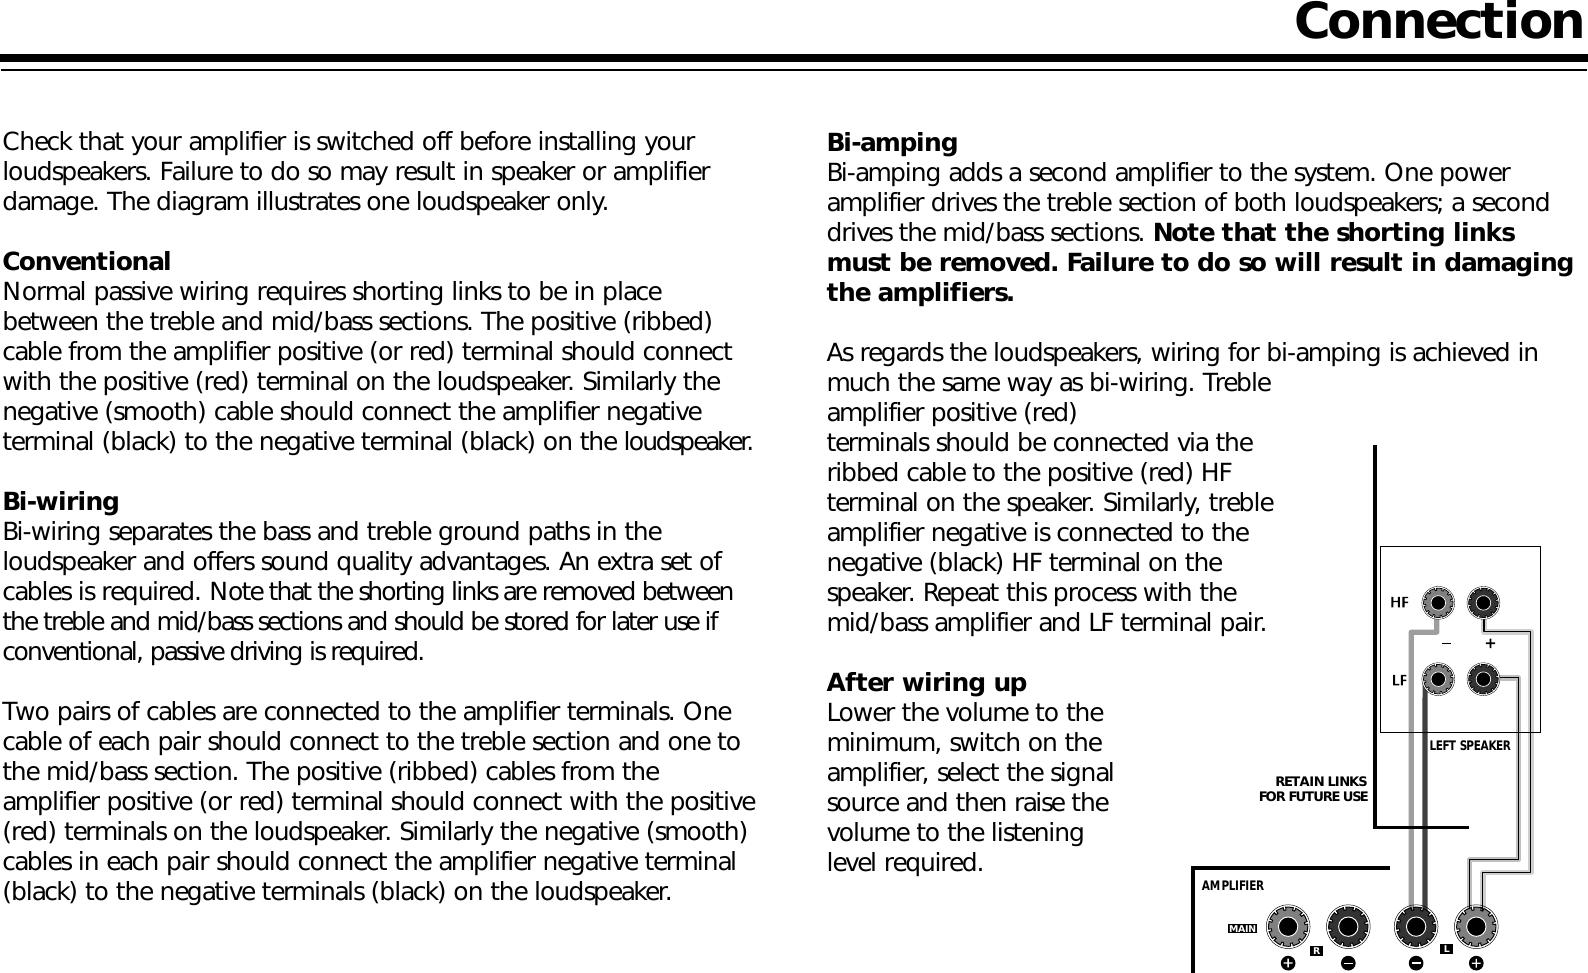 Acoustic Energy Aelite Three Users Manual Aesprit 300